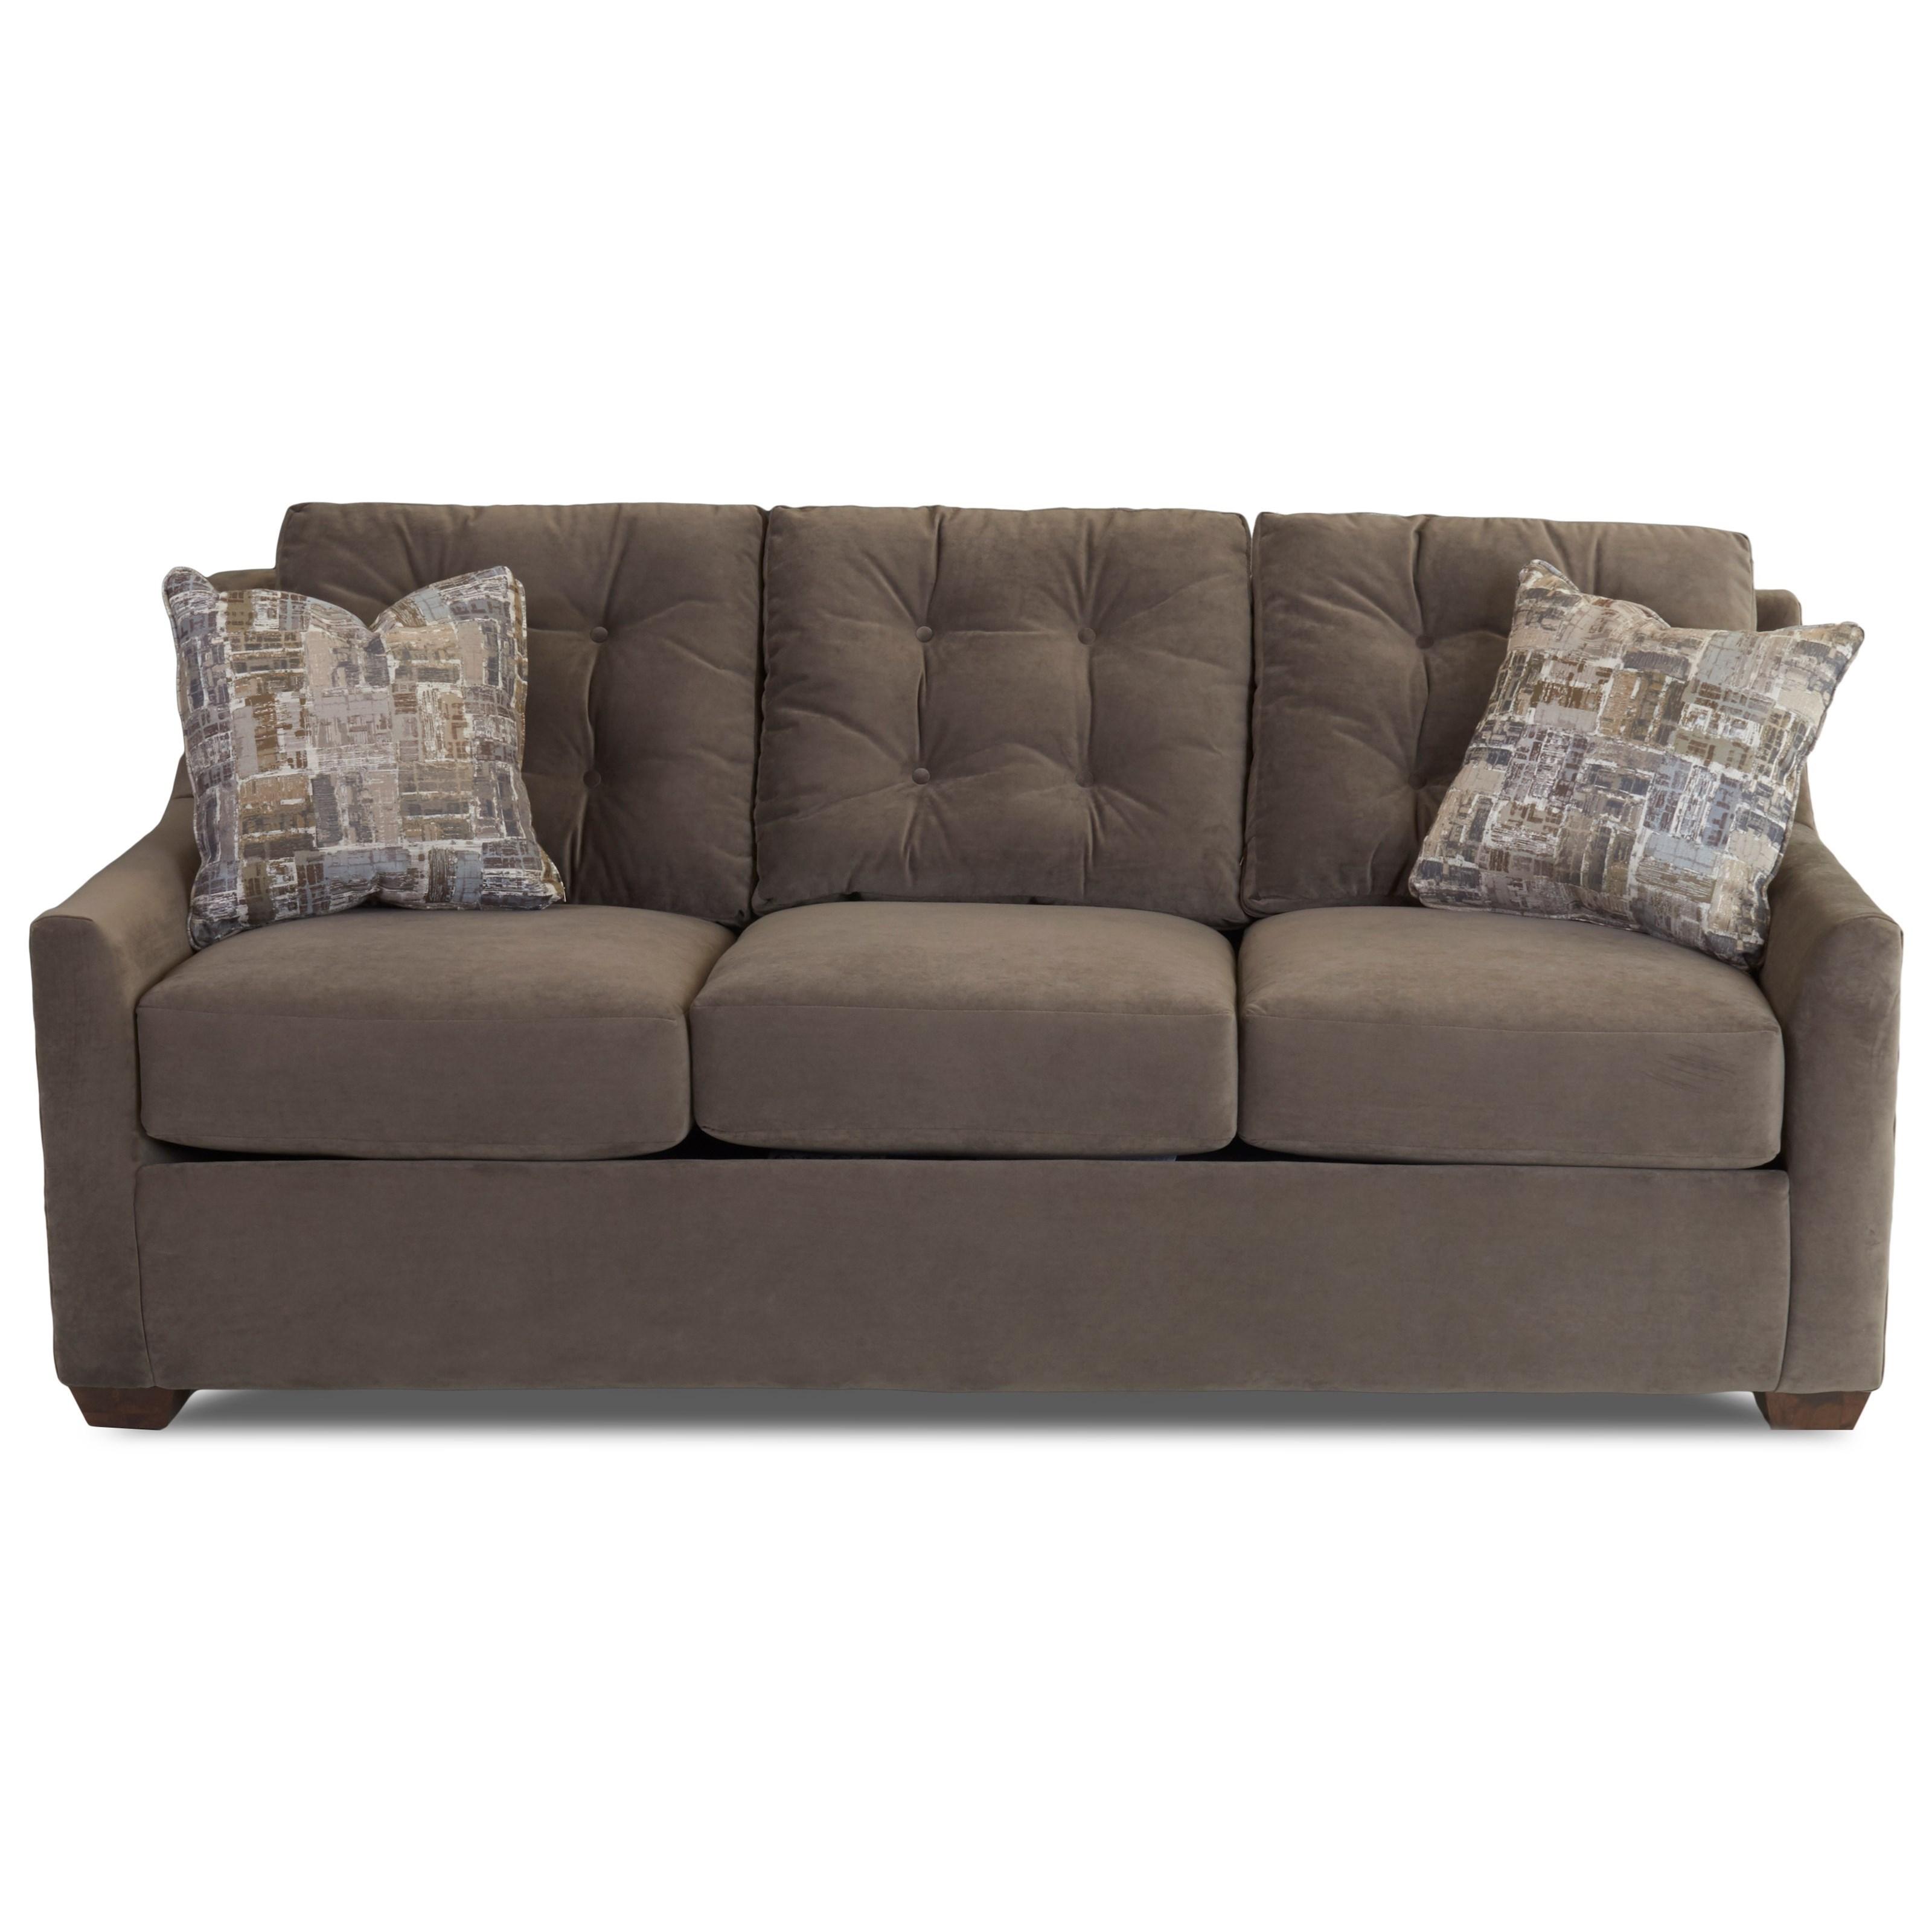 Grayton Sofa by Klaussner at Johnny Janosik